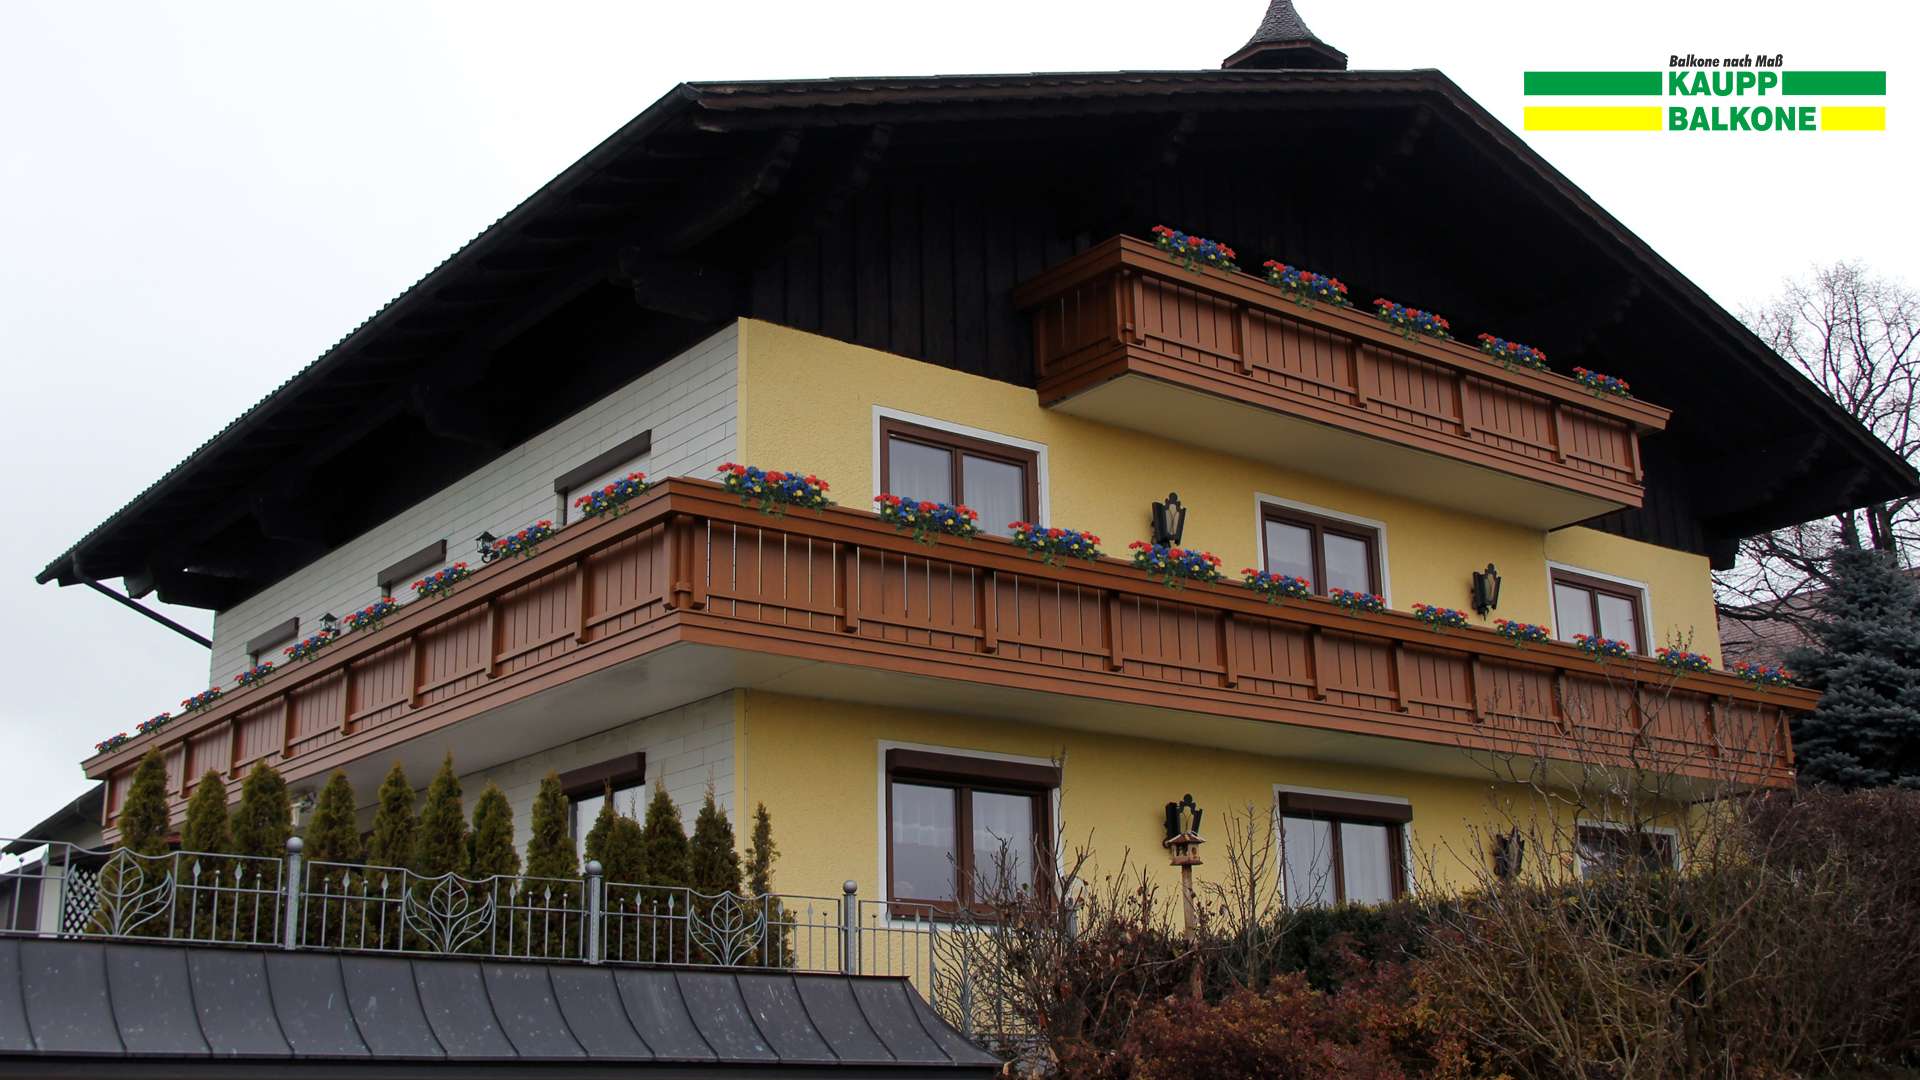 balkongel nder alu ab 161 kaupp balkone. Black Bedroom Furniture Sets. Home Design Ideas